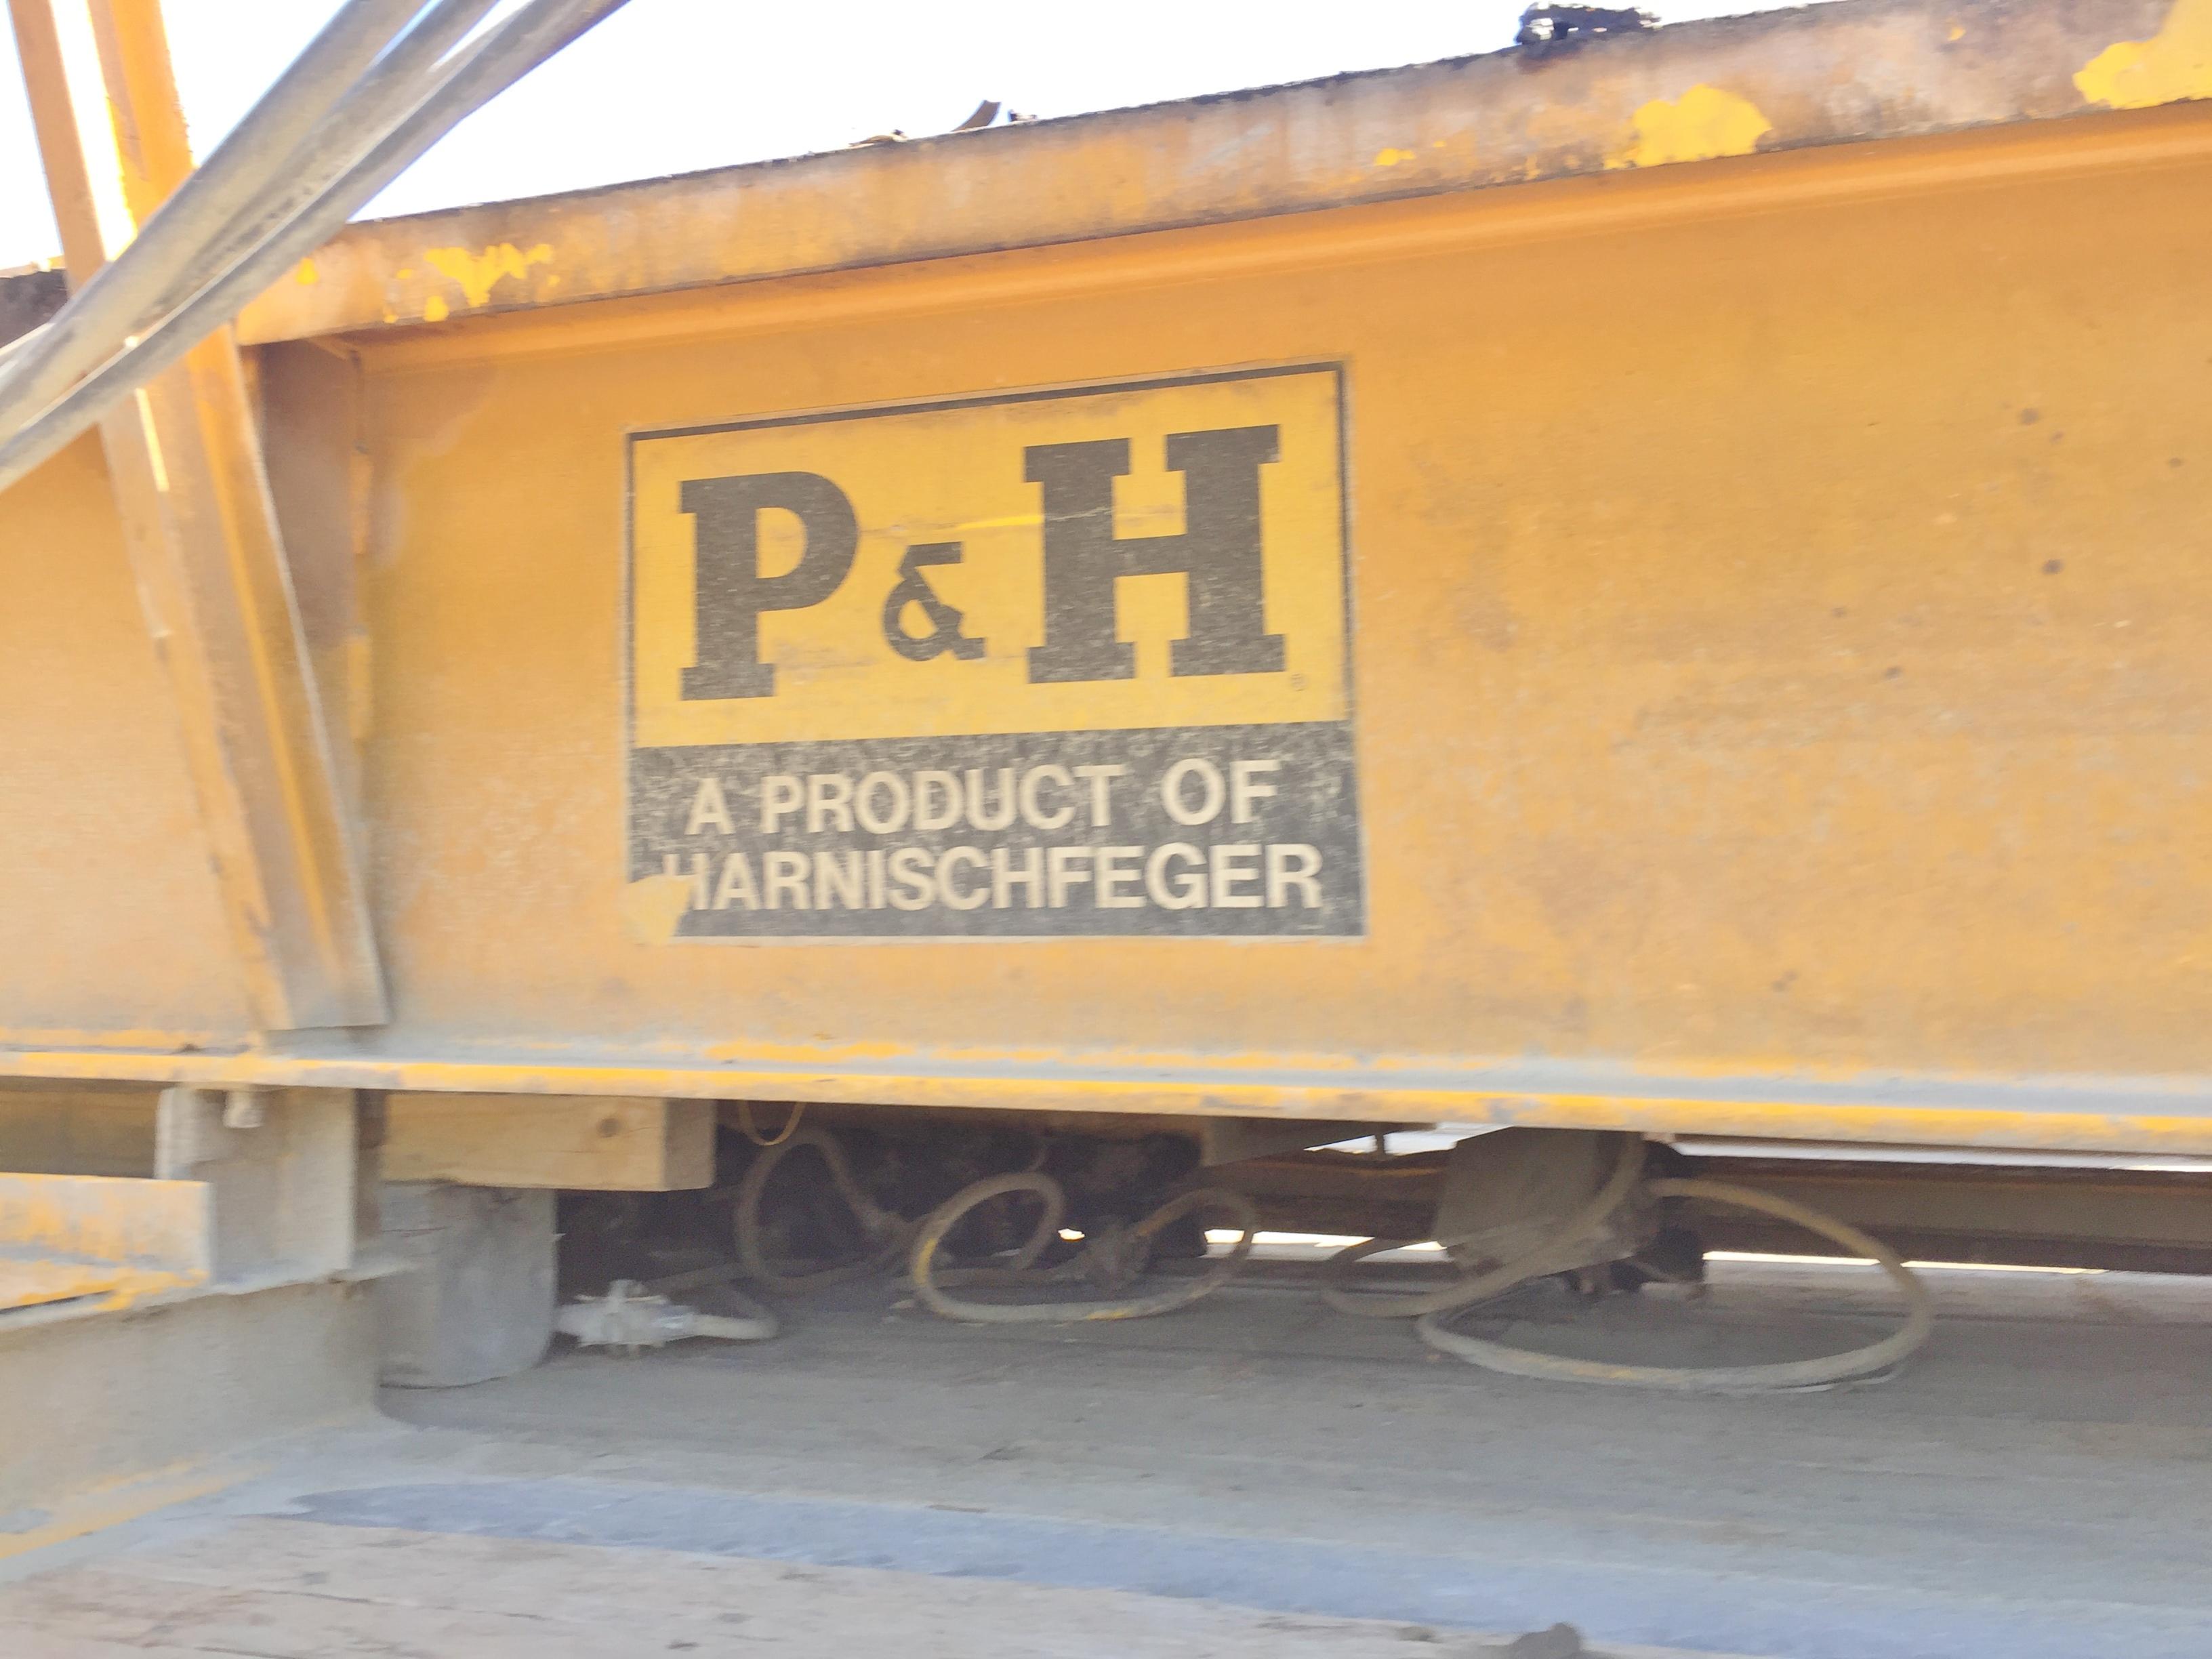 Lot 44 - P&H 5 Ton Bridge Crane